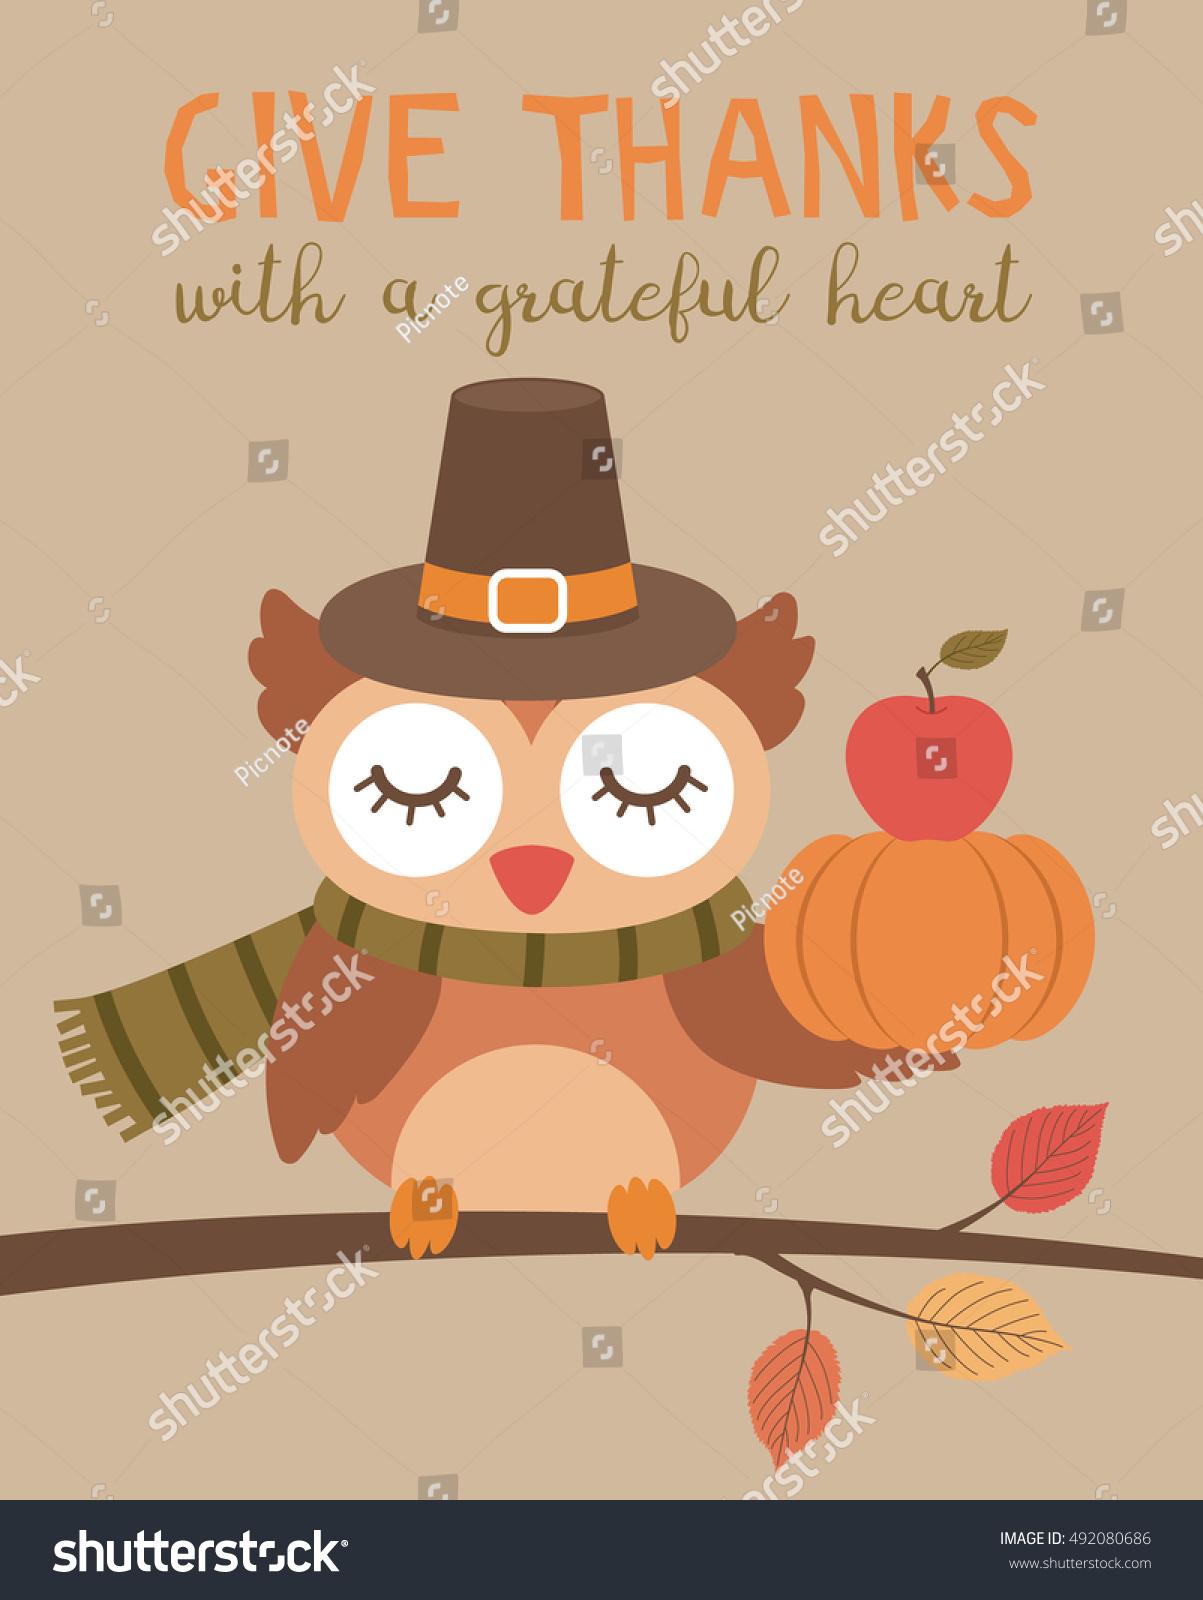 Cute owl cartoon illustration thanksgiving card stock vector cute owl cartoon illustration for thanksgiving card design m4hsunfo